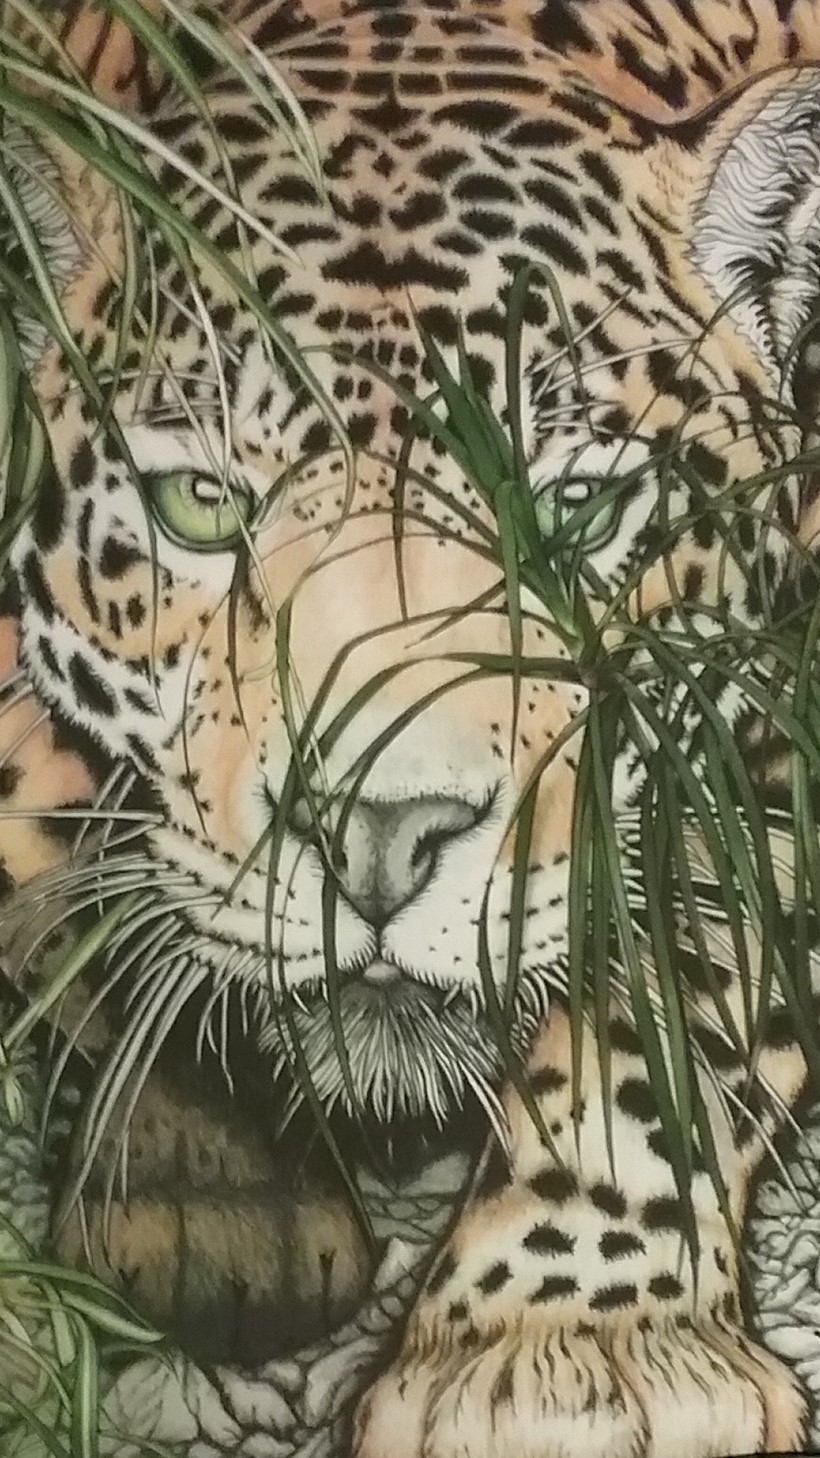 Crouching leopard.jpg